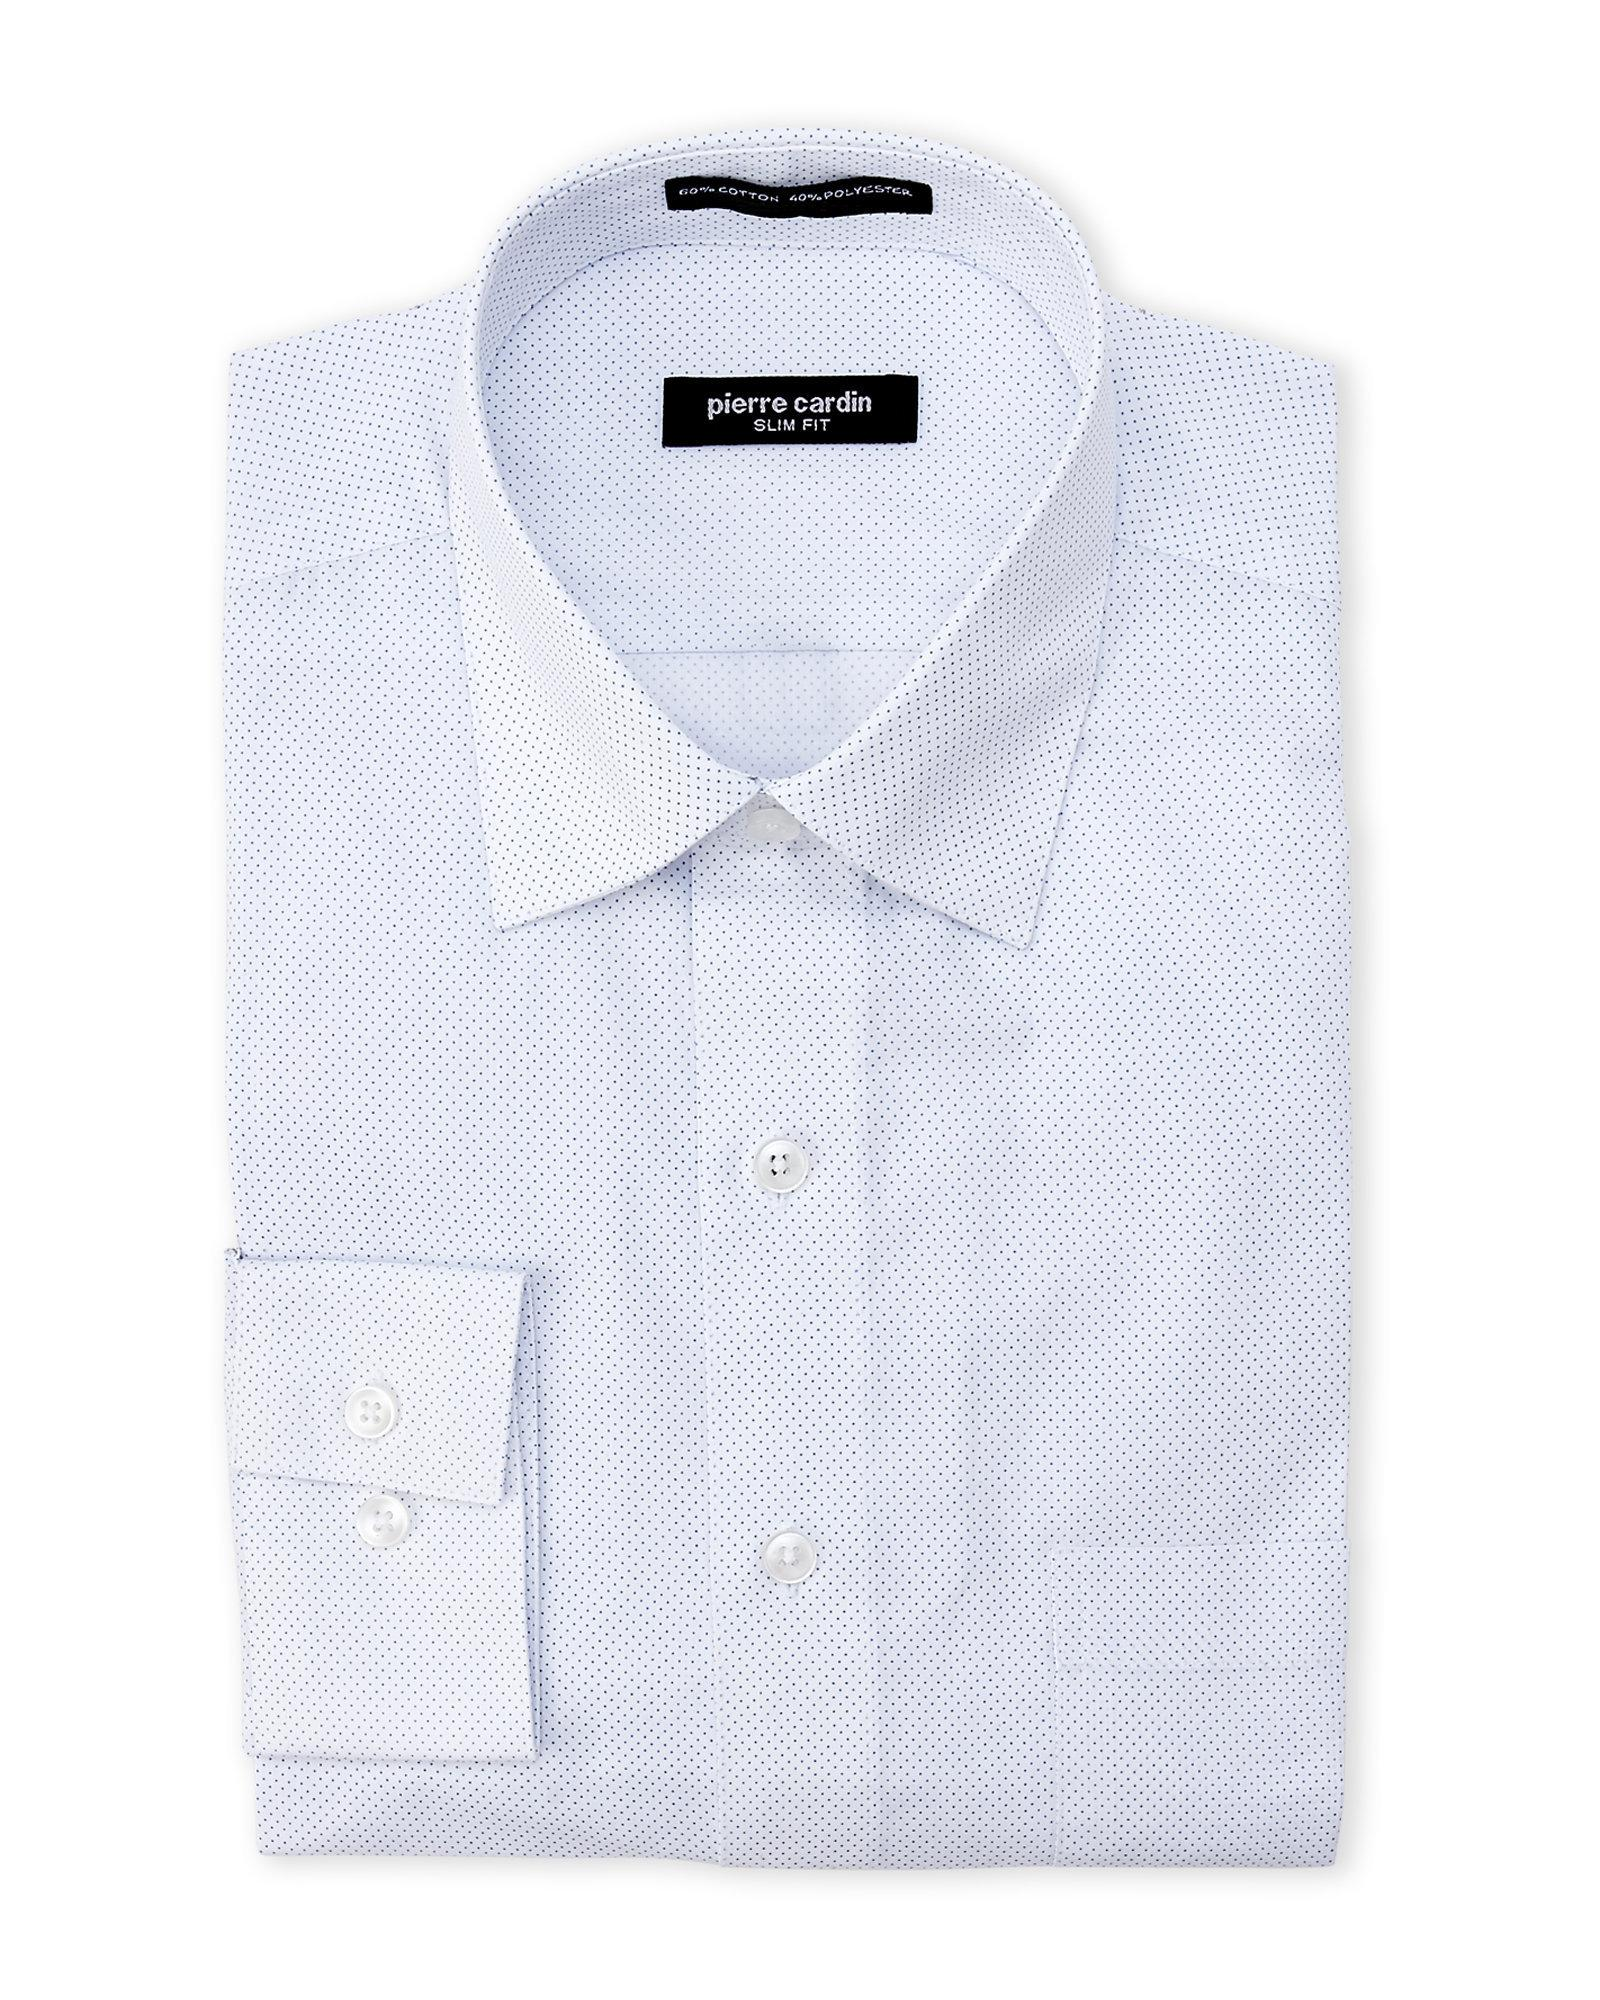 Pierre cardin slim fit cobalt dotted dress shirt in blue for Century 21 dress shirts